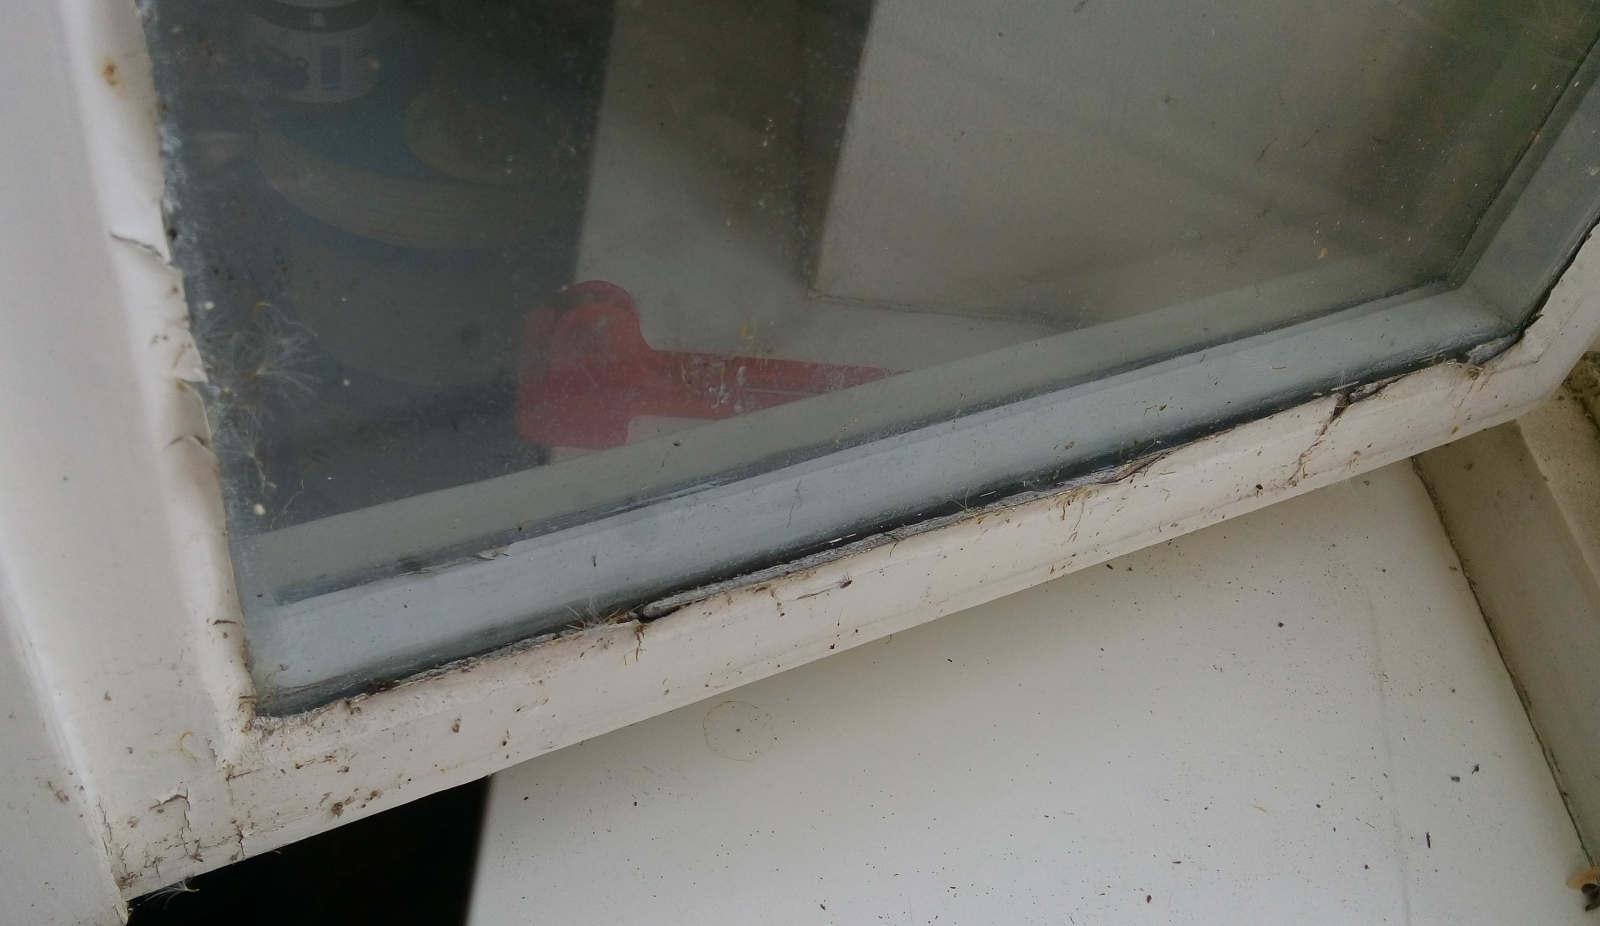 Gut bekannt Fensterkitt Weiß | Aubi Siegenia Reparatur Set Ew001 Ecklager PD12